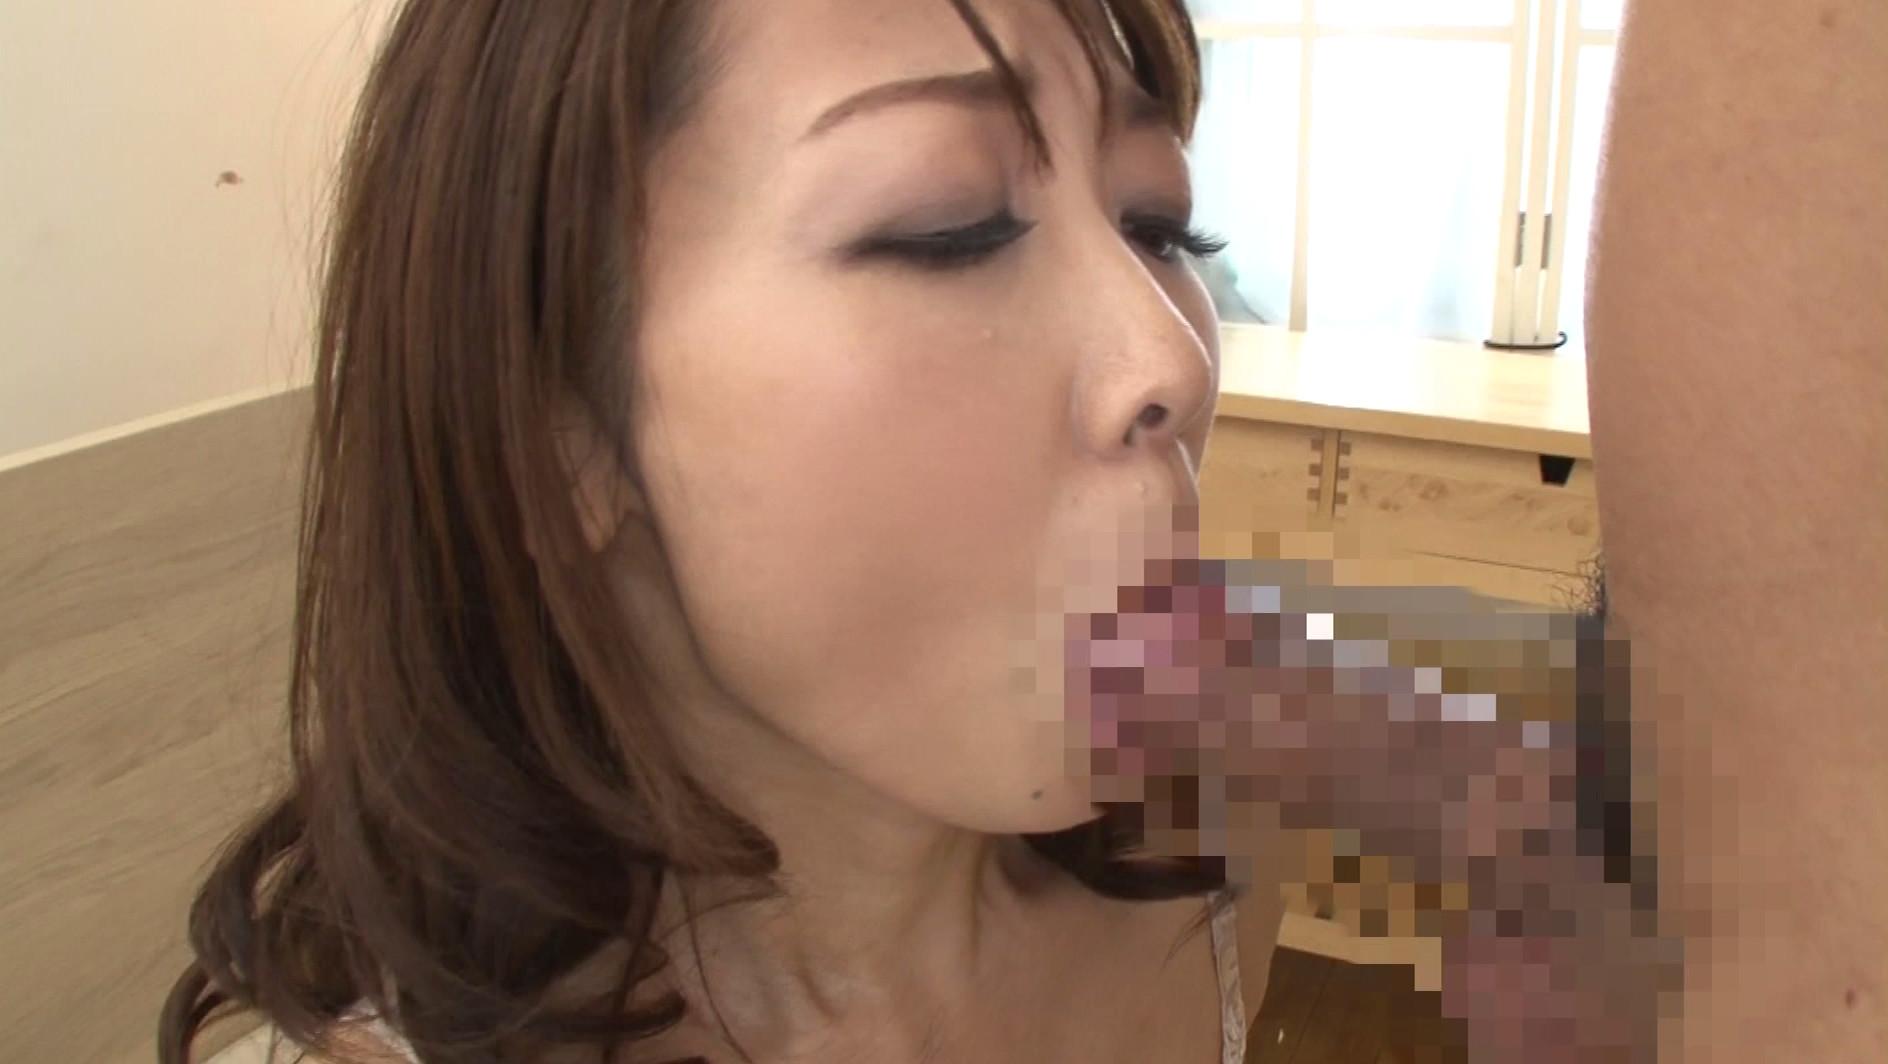 熟女AV女優の在籍店 9店目 [転載禁止]©bbspink.comxvideo>1本 ->画像>45枚